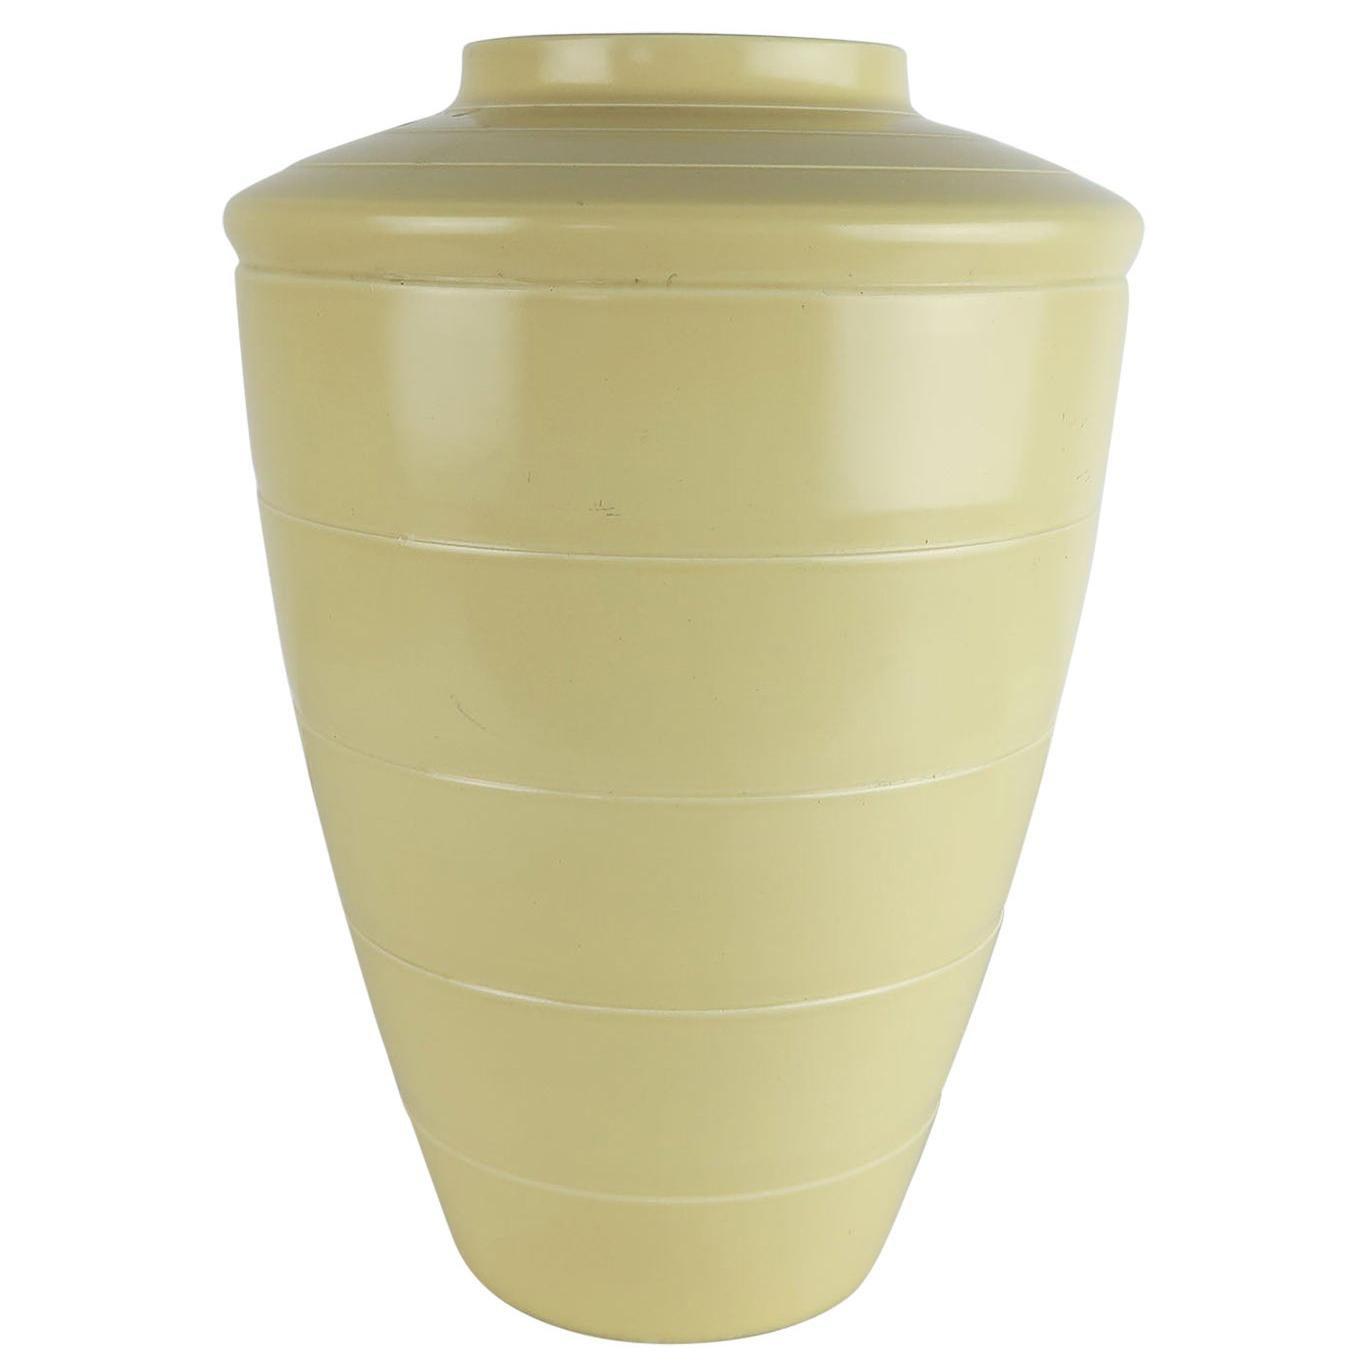 Large Original Art Deco Ceramic Vase by Keith Murray, C.1930